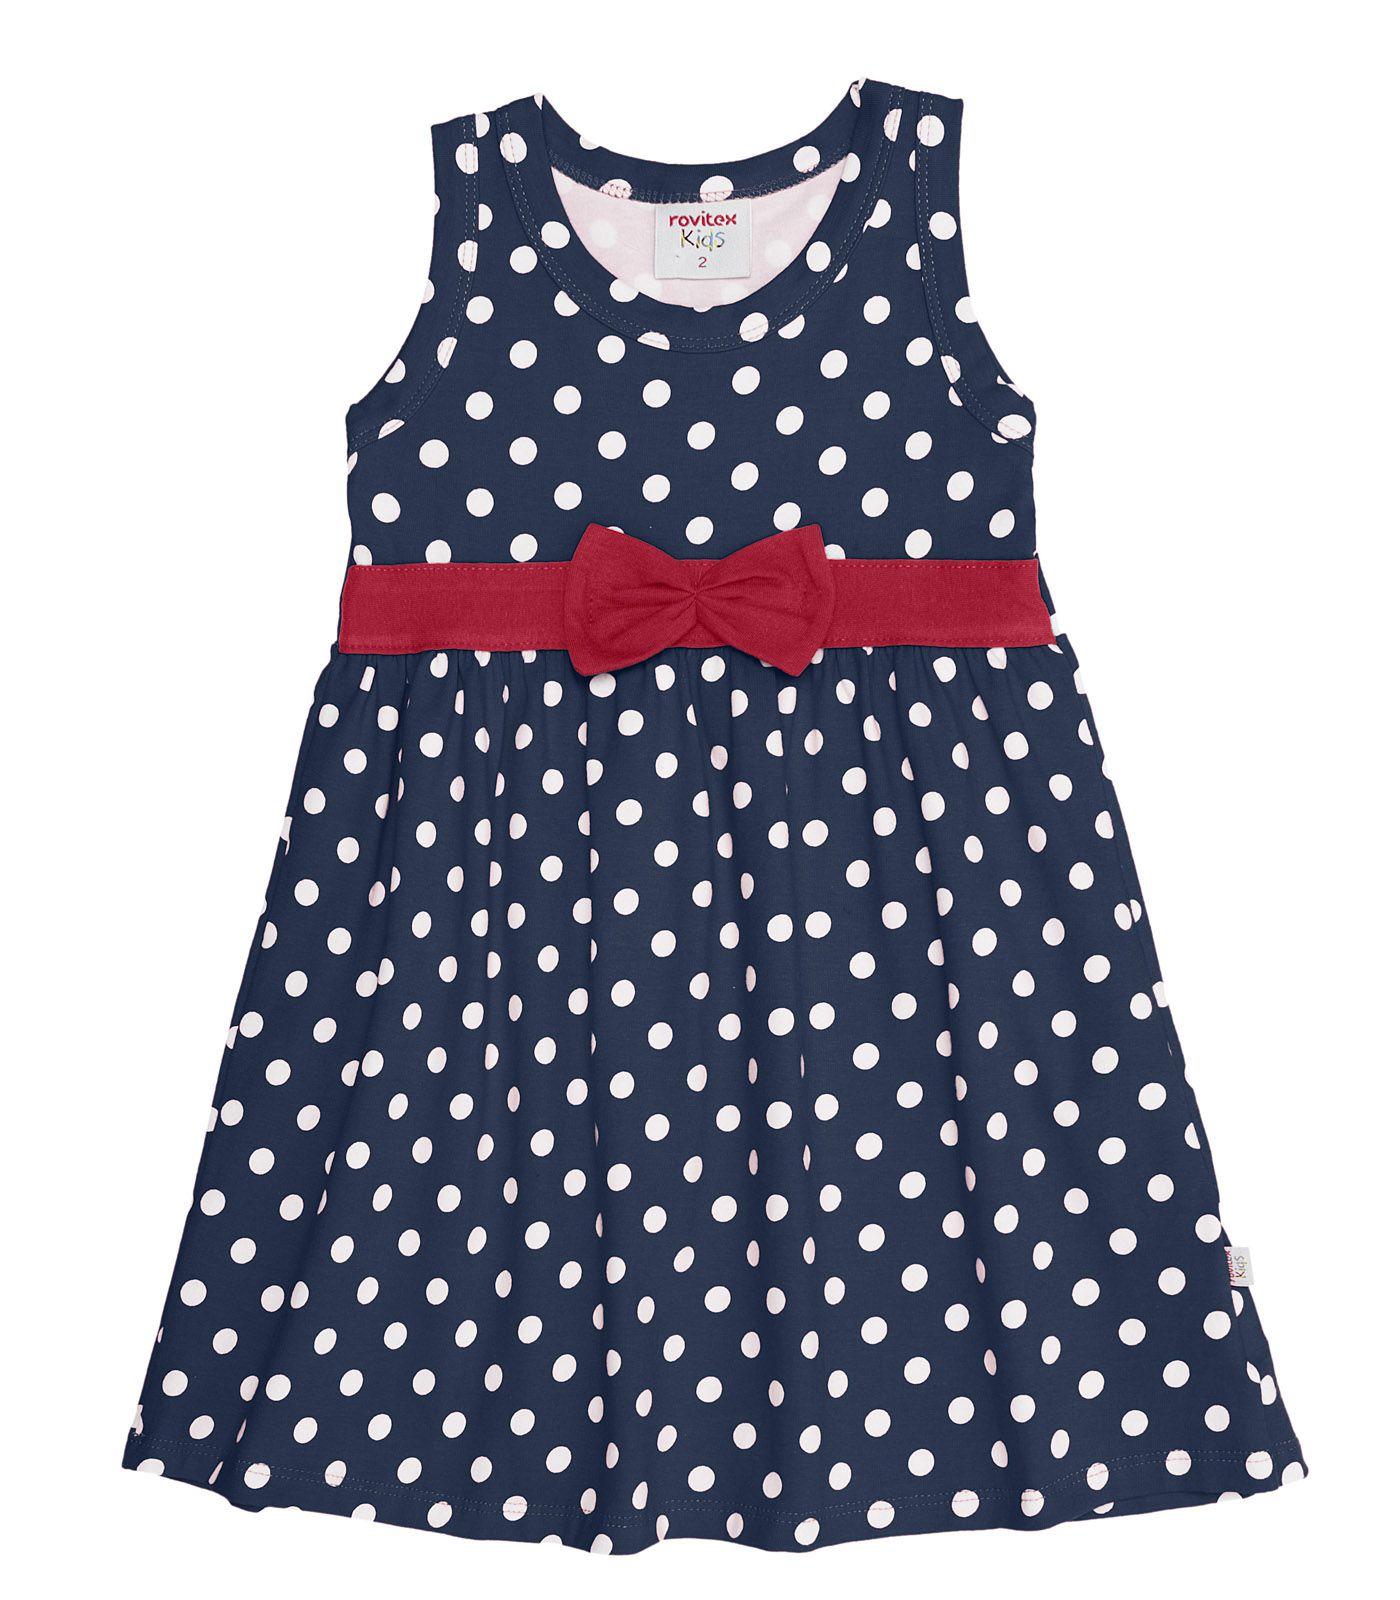 Vestido Cotton Leve com Laço - Rovitex Kids